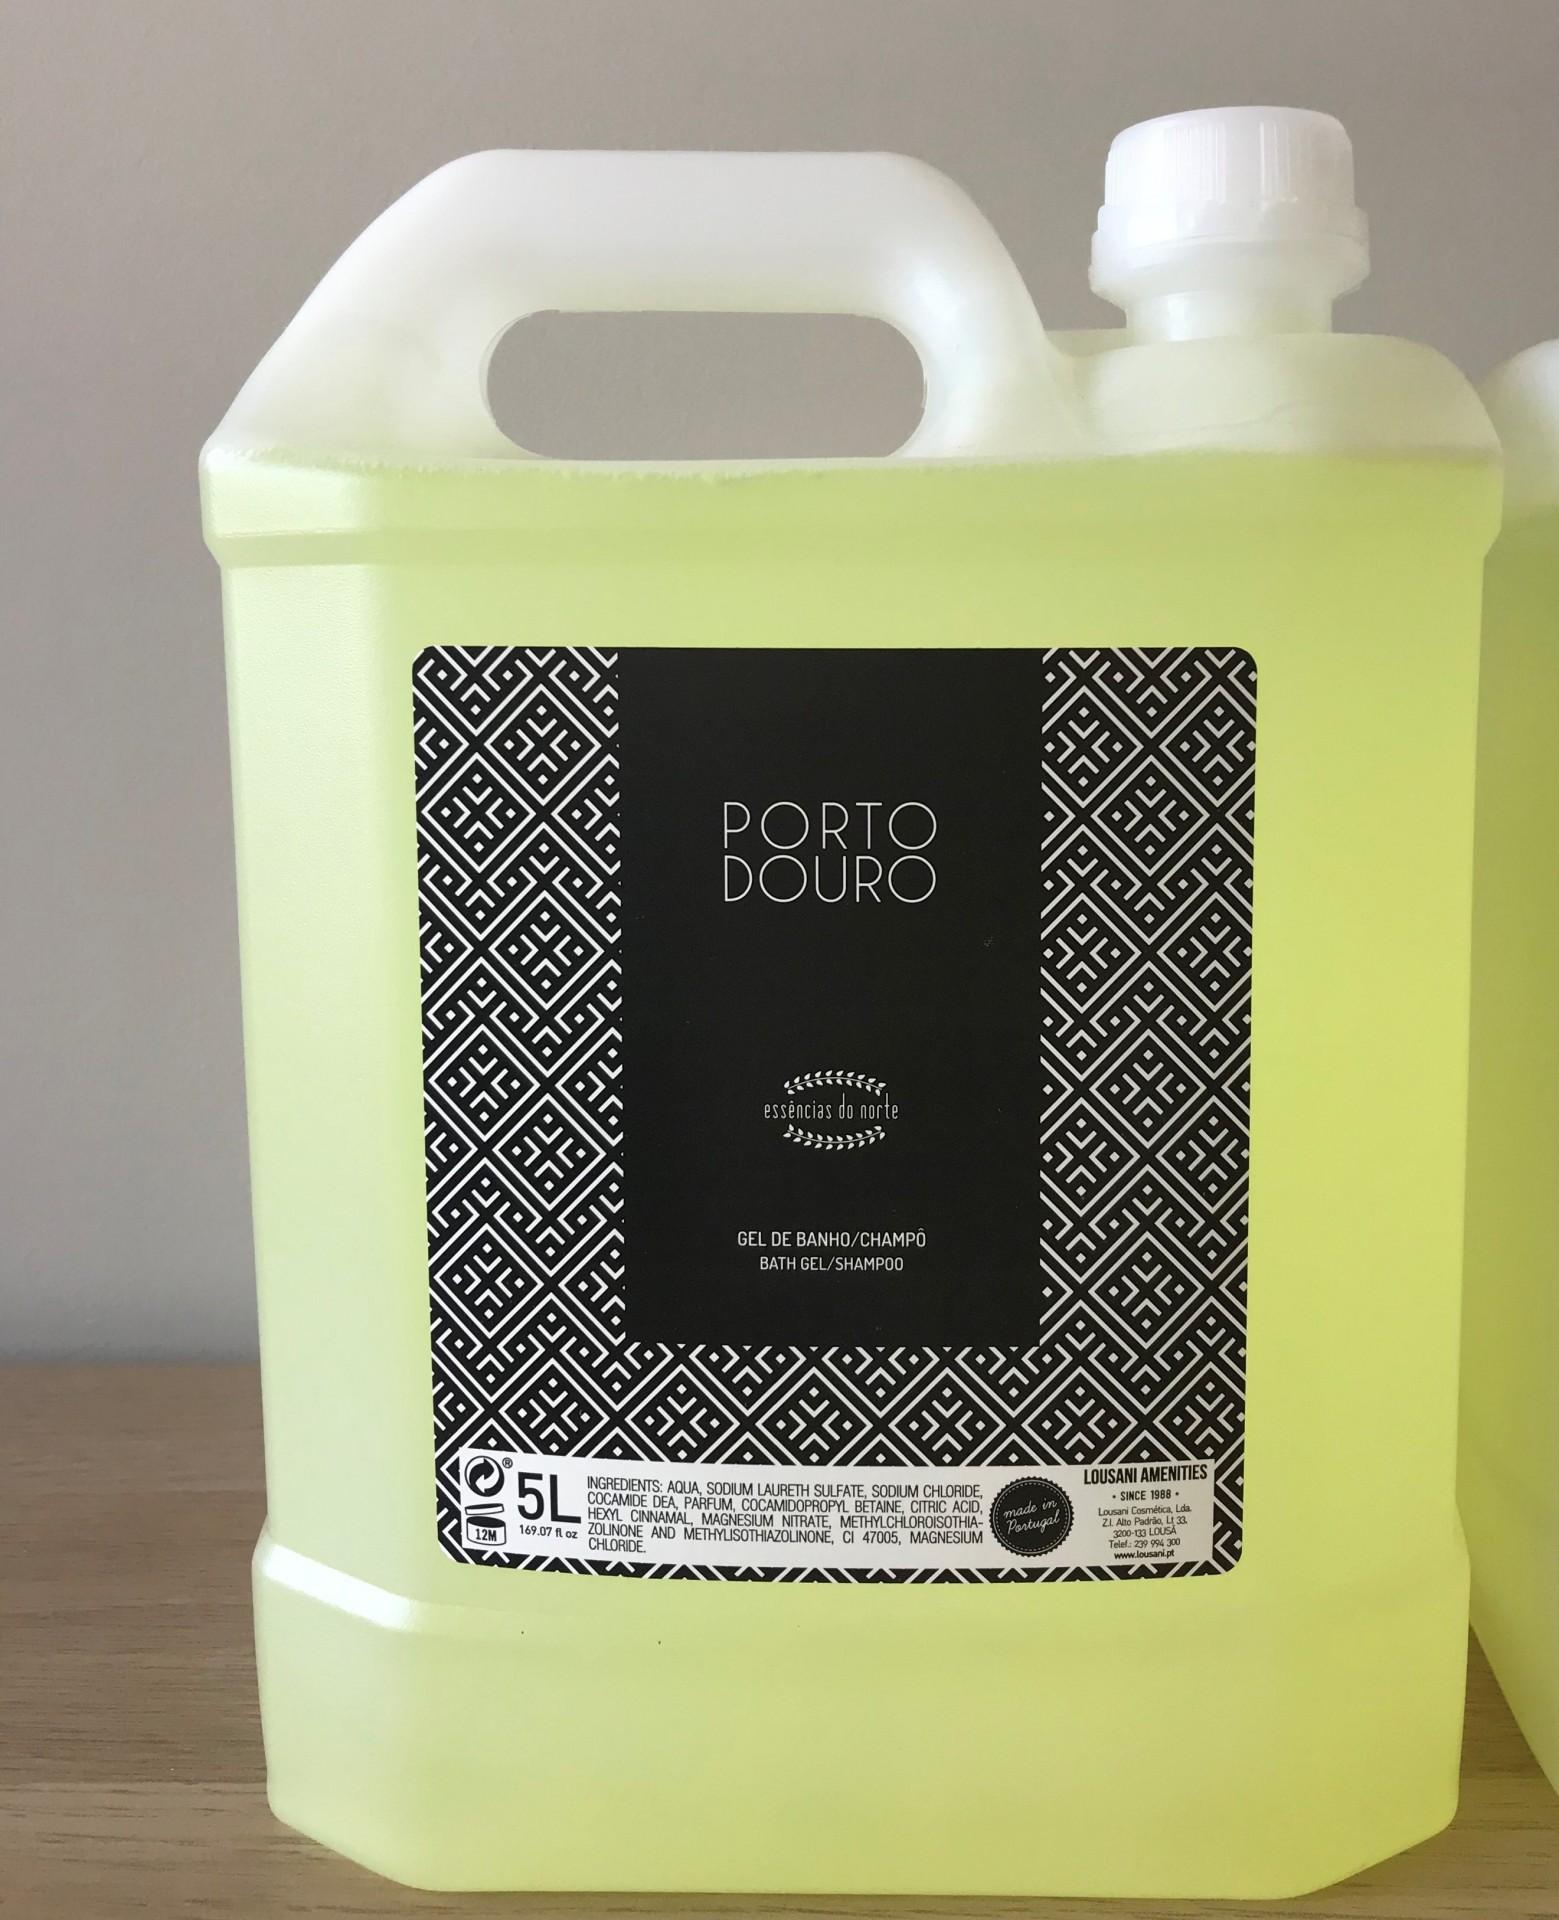 Recargo 5l Champo/ gel banho Porto Douro